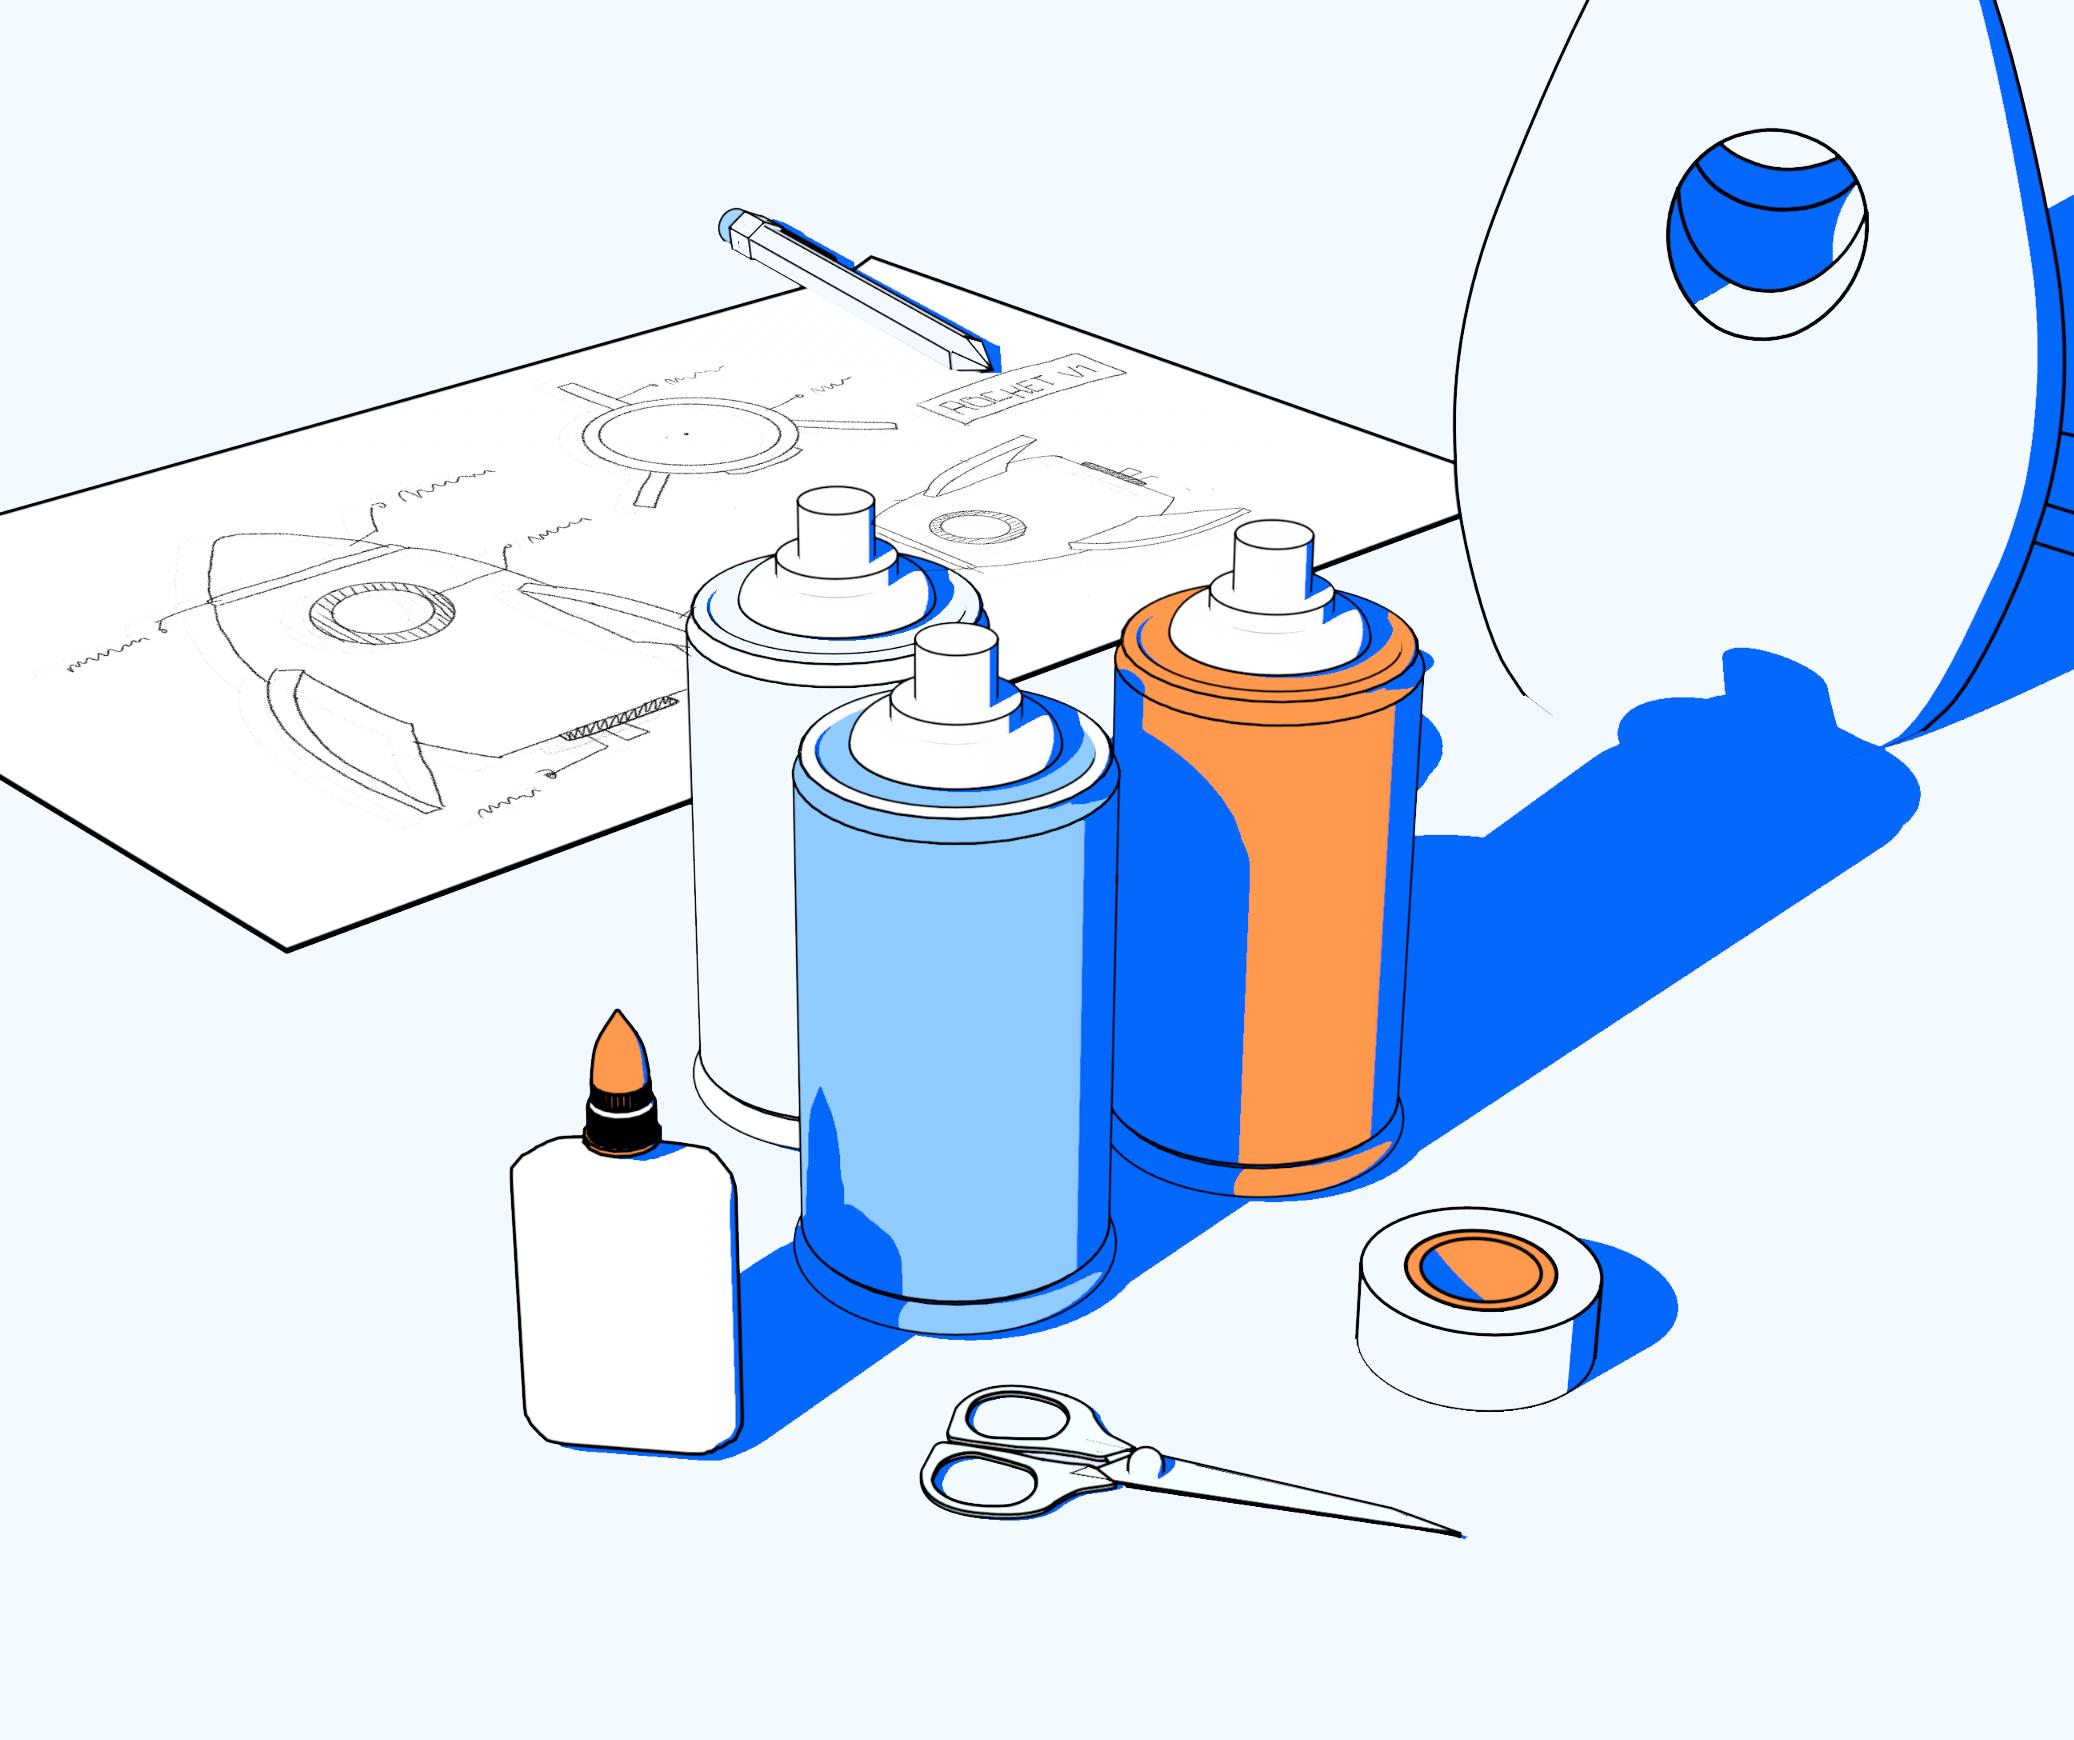 product-management-tools-thumbnail